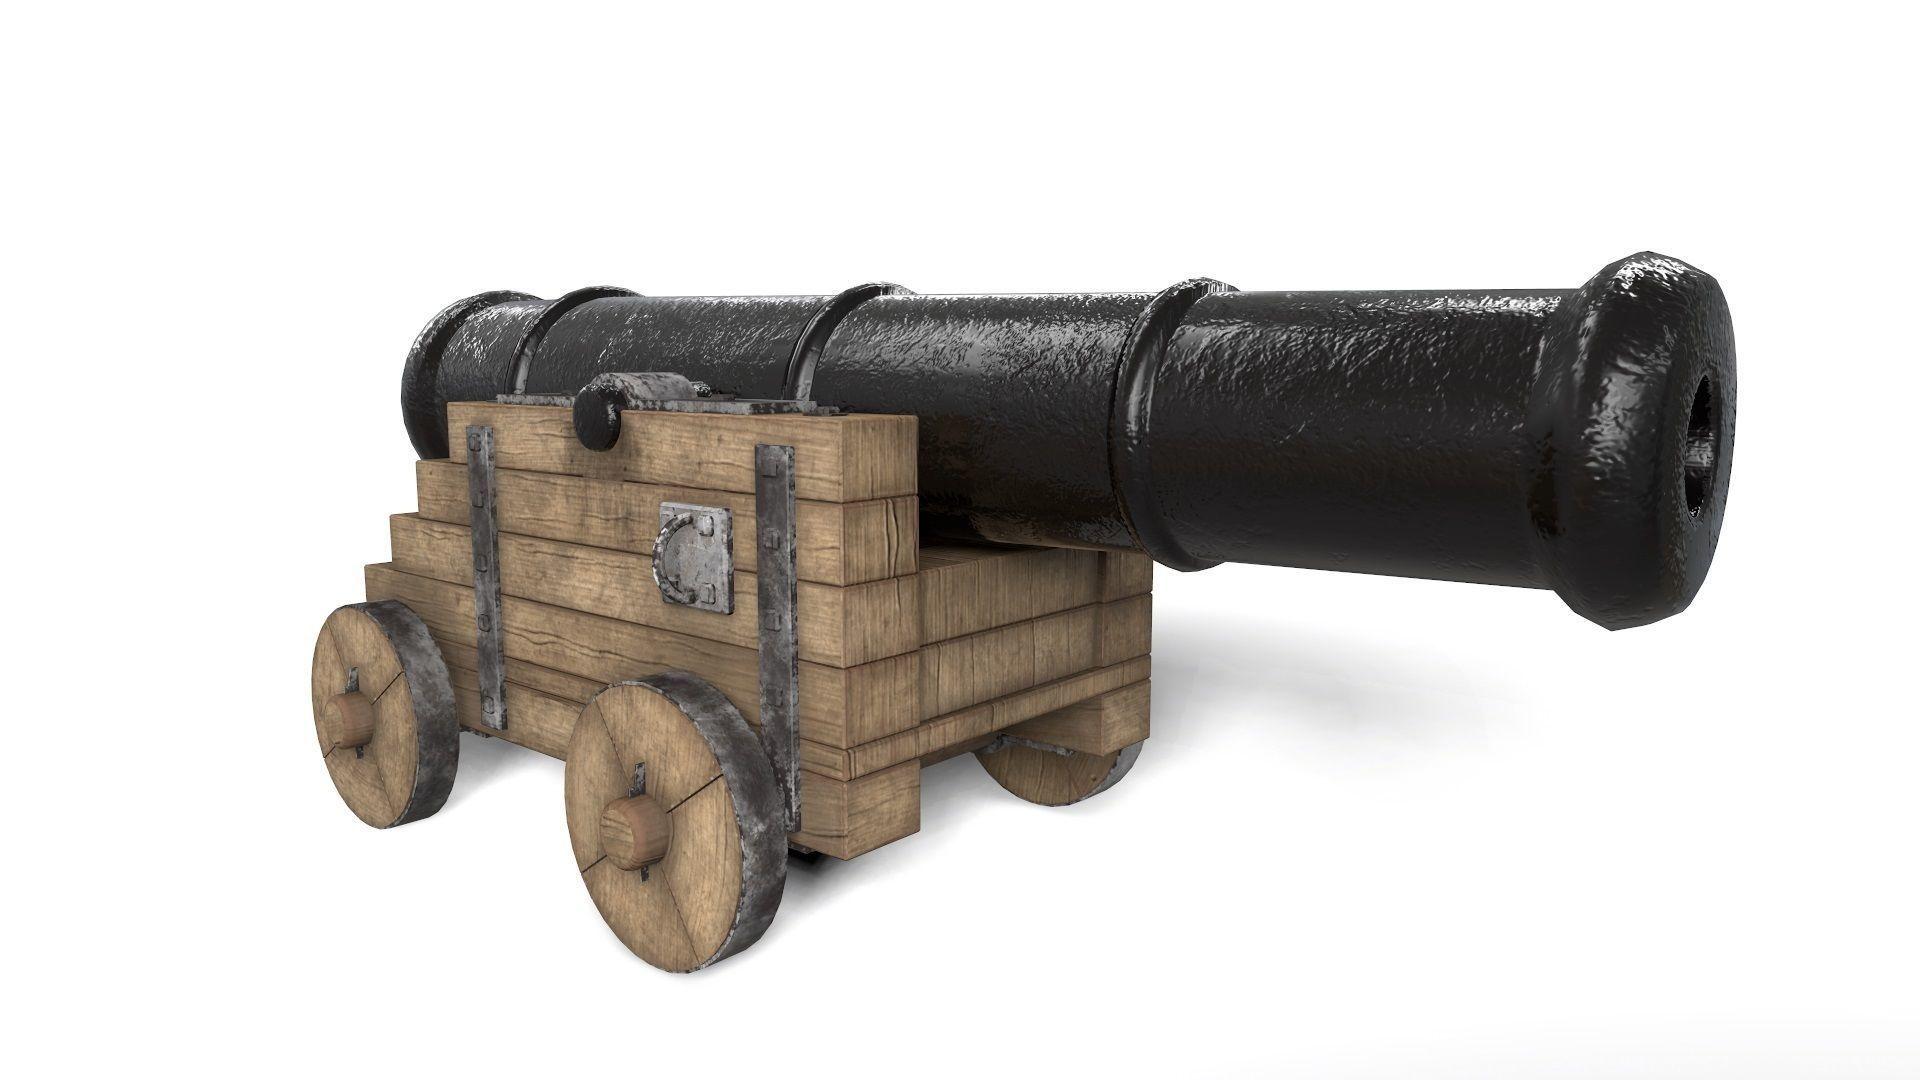 Cannon photo